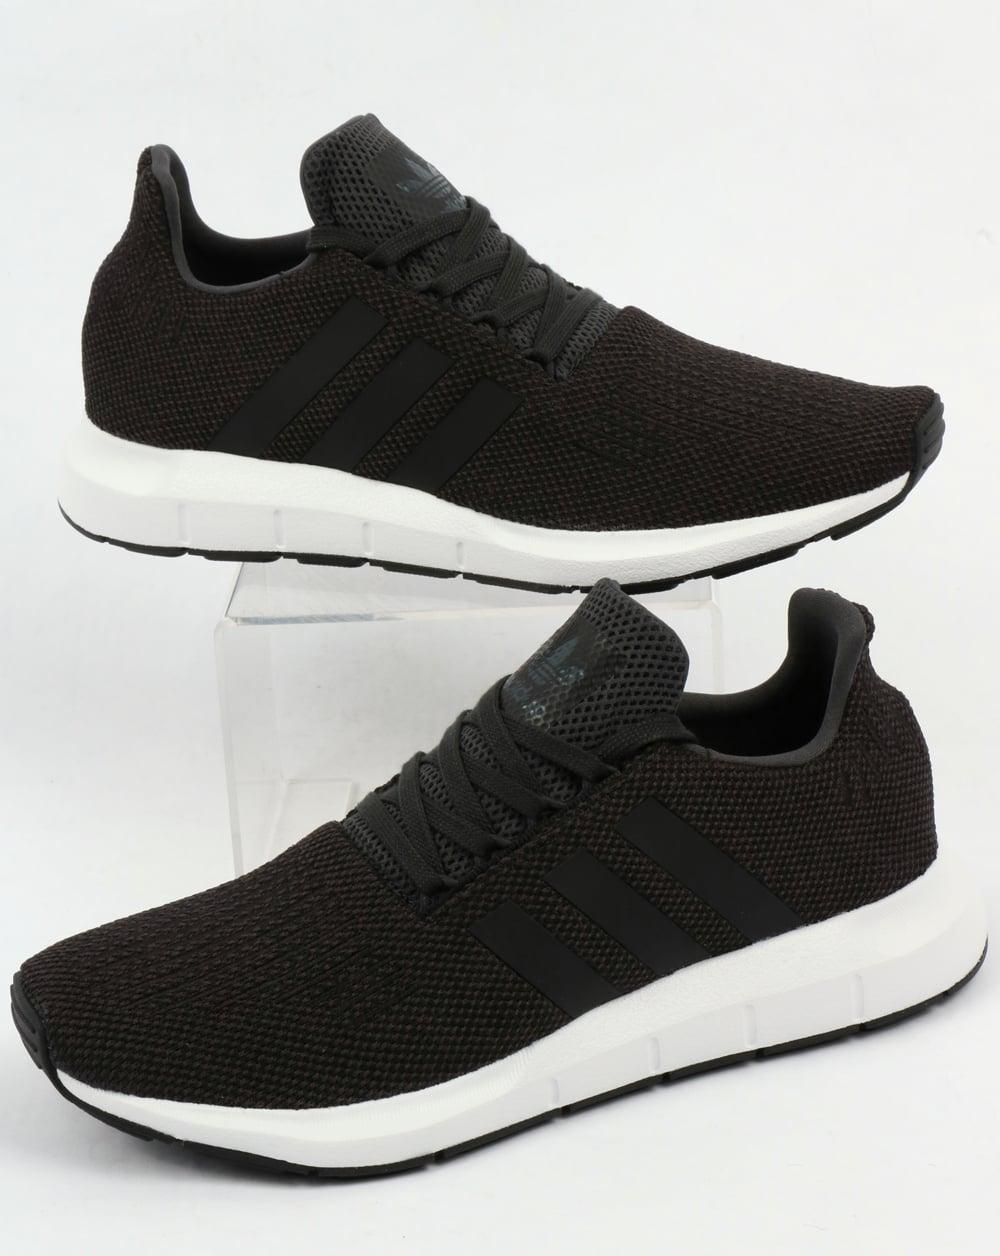 3019b85c8 adidas Trainers Adidas Swift Run Trainers Carbon Black Grey